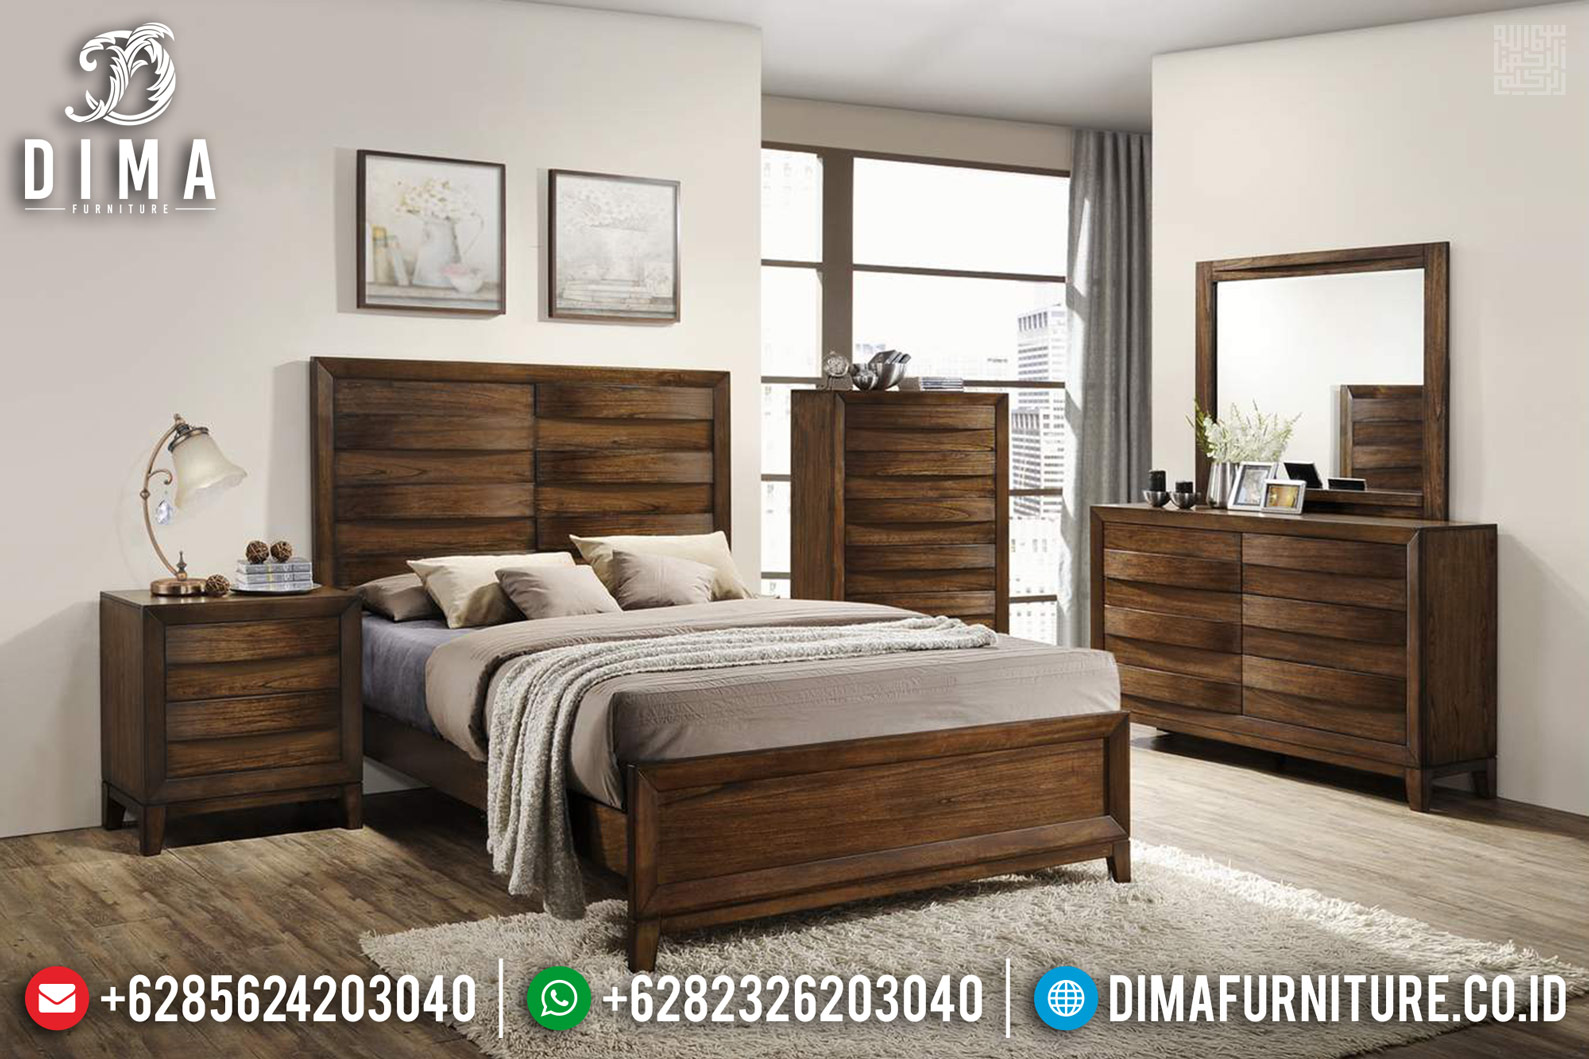 Dipan Minimalis Modern, Tempat Tidur Jati Jepara, Kamar Set Minimalis DF-1162